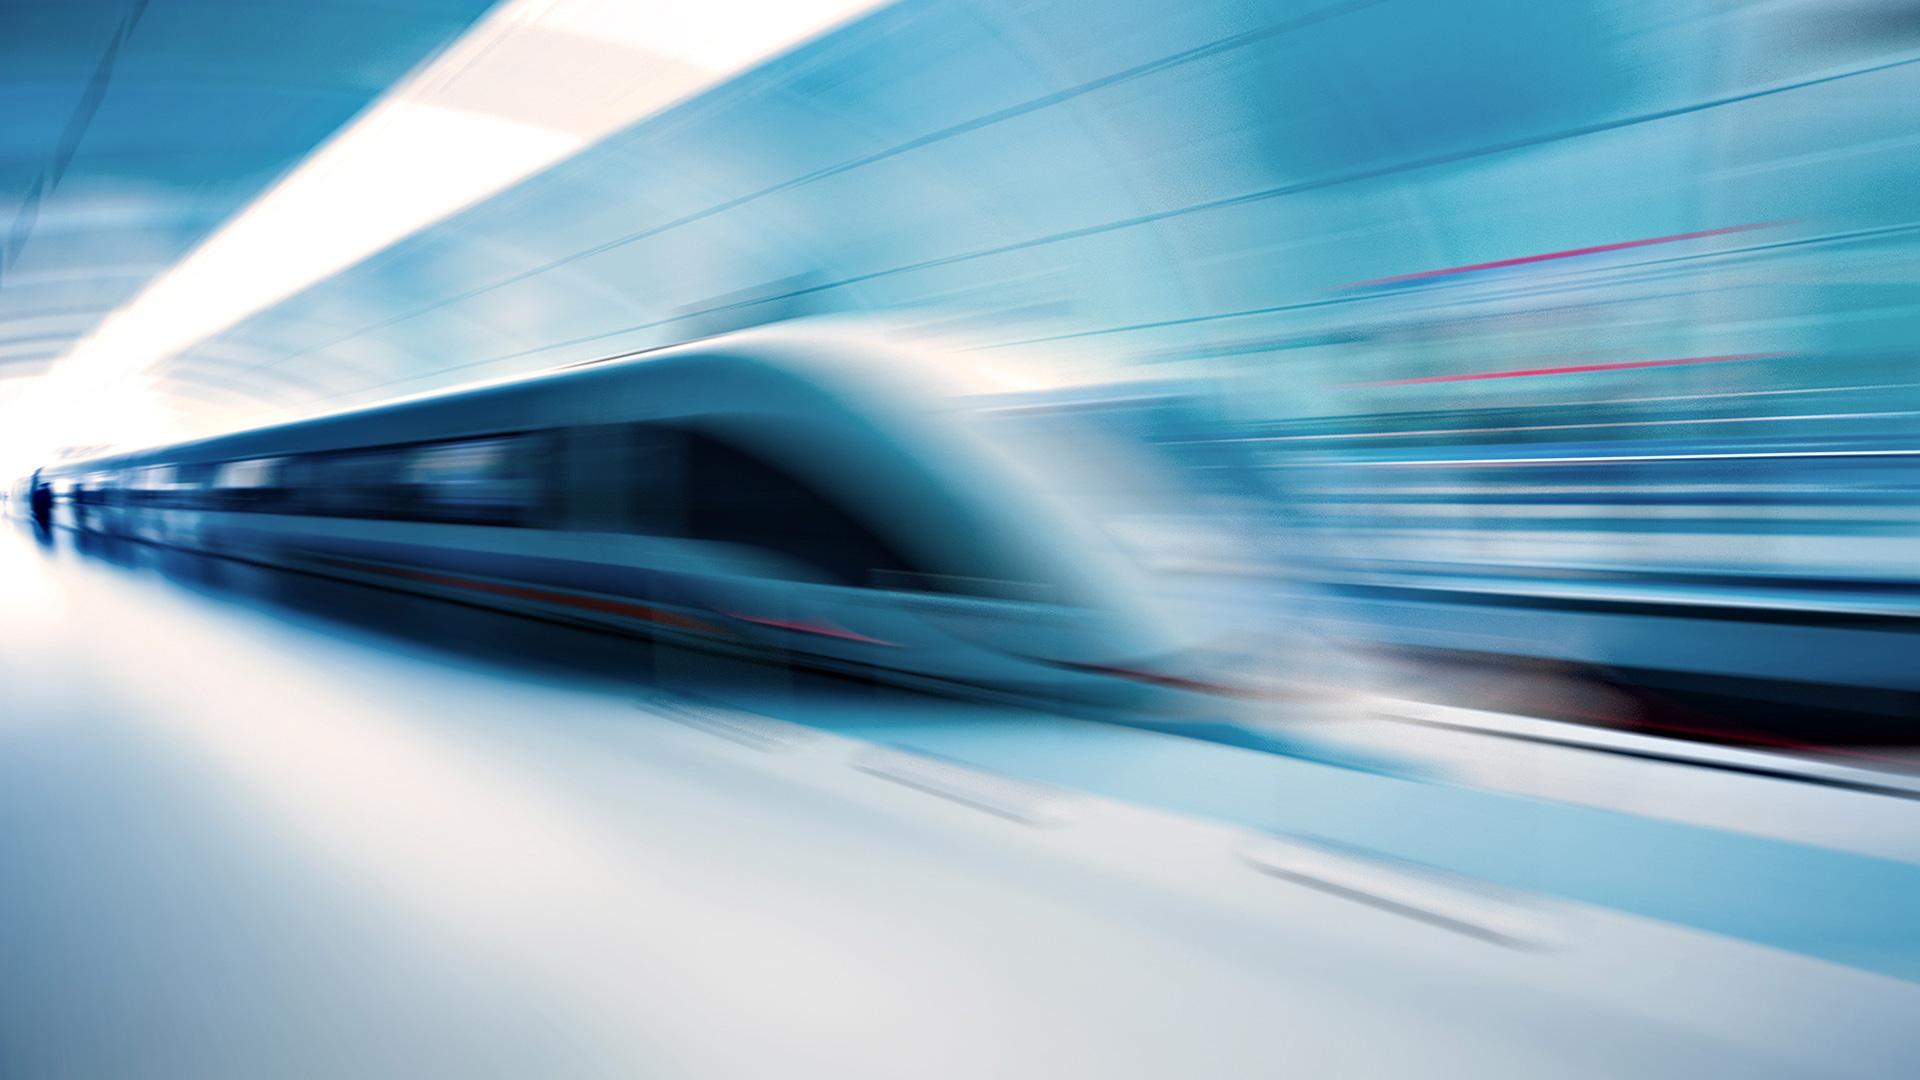 speed blur wallpaper 37155 1920x1080px